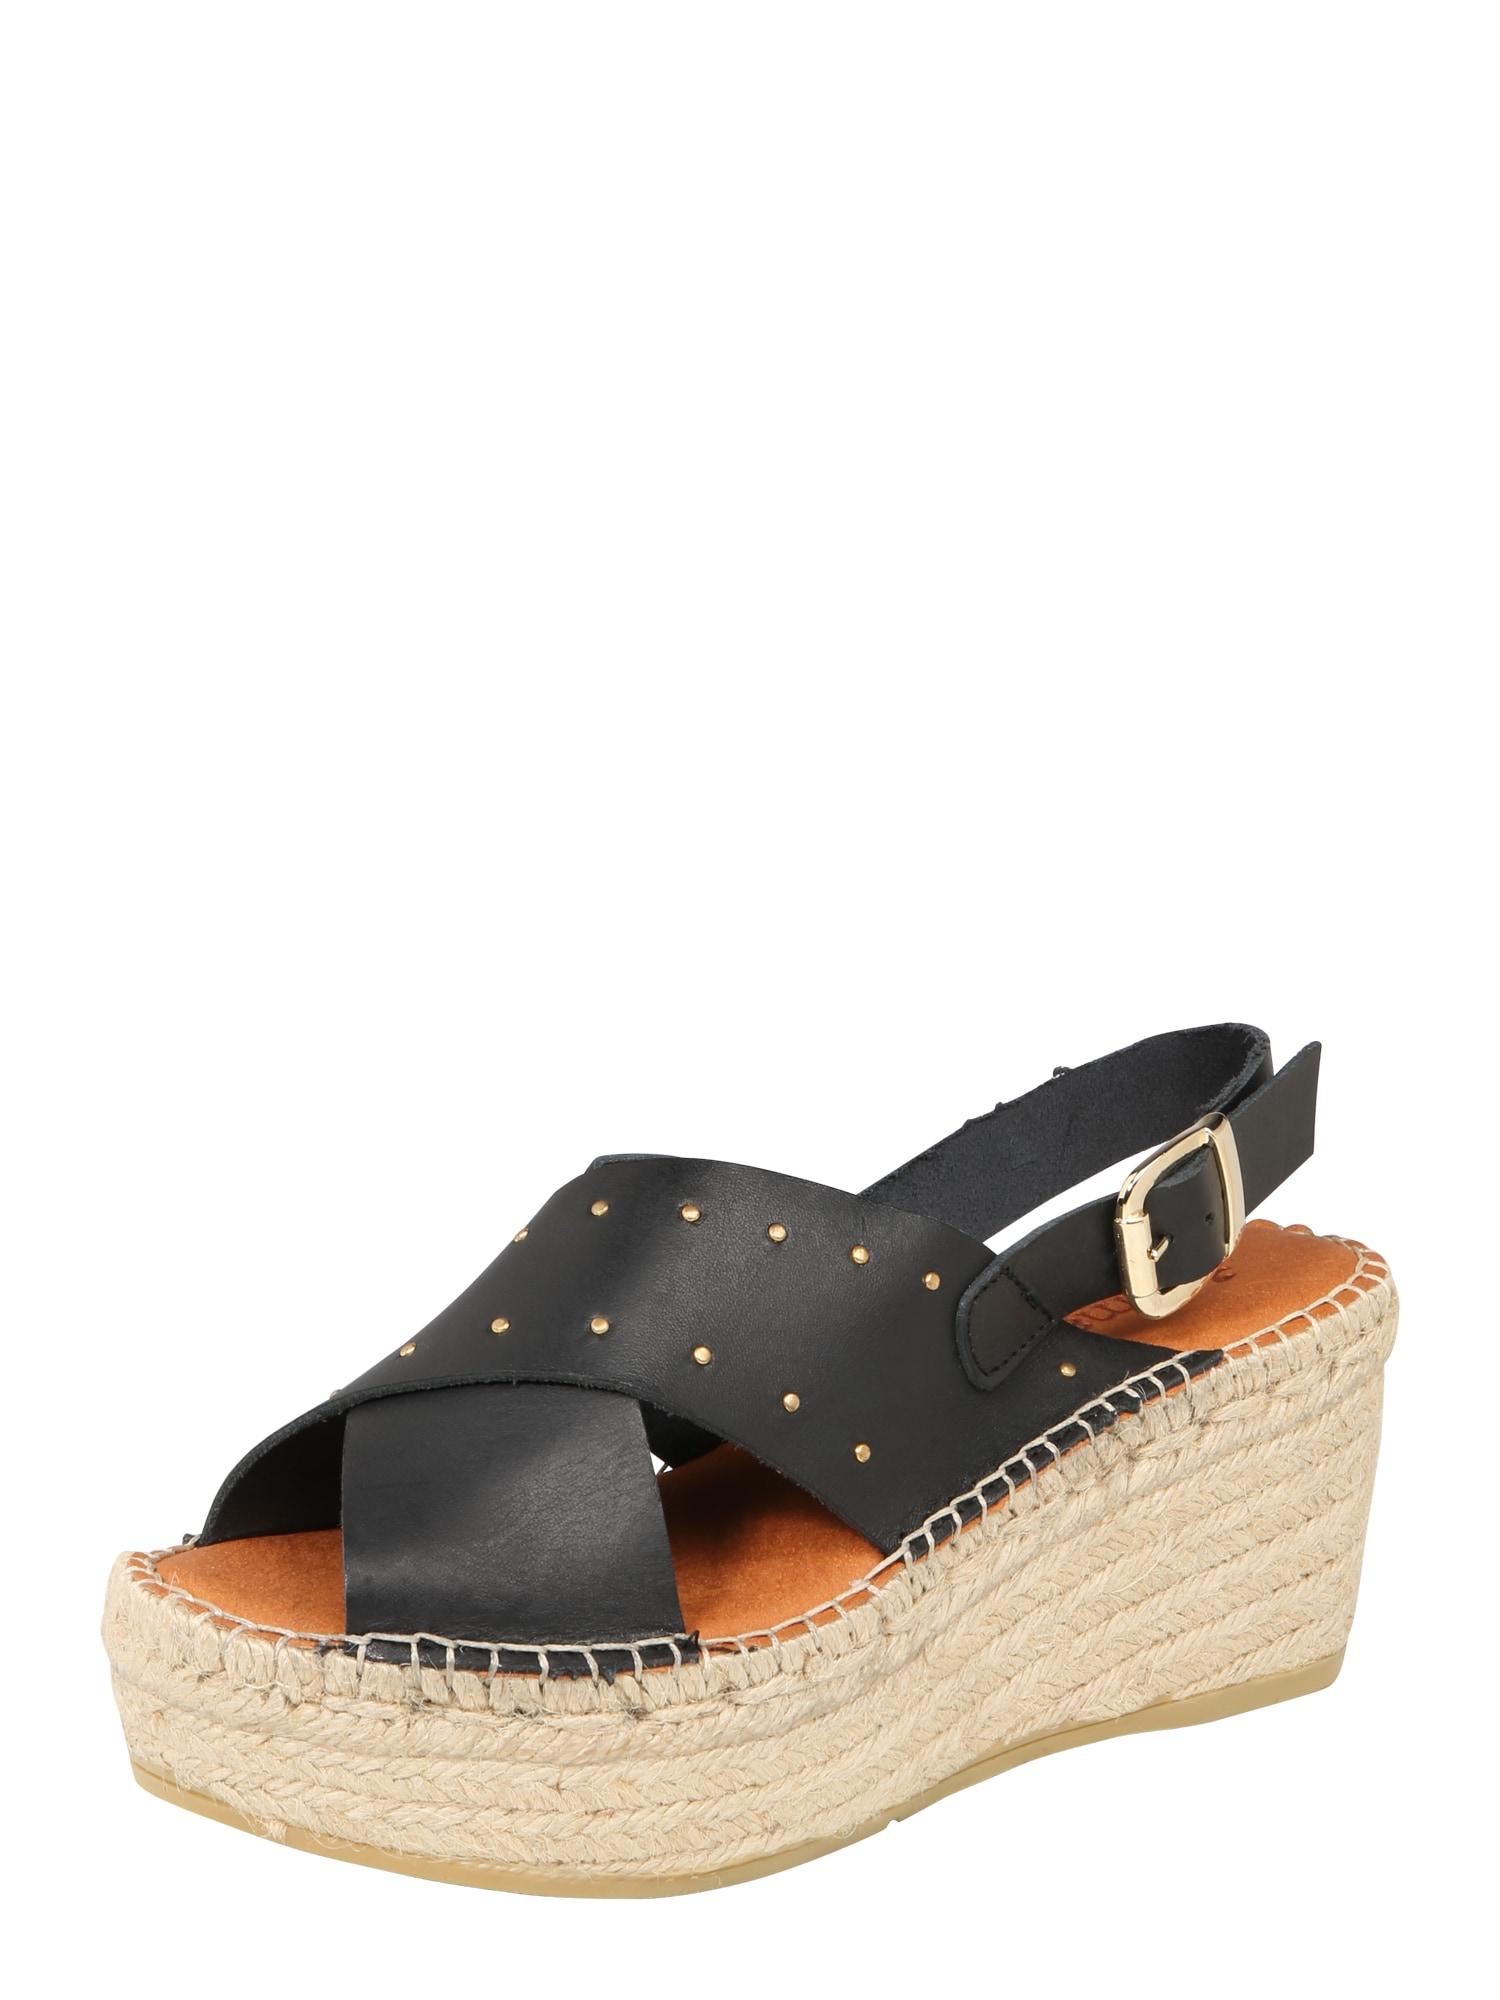 Sandály Naya 25 černá MACARENA